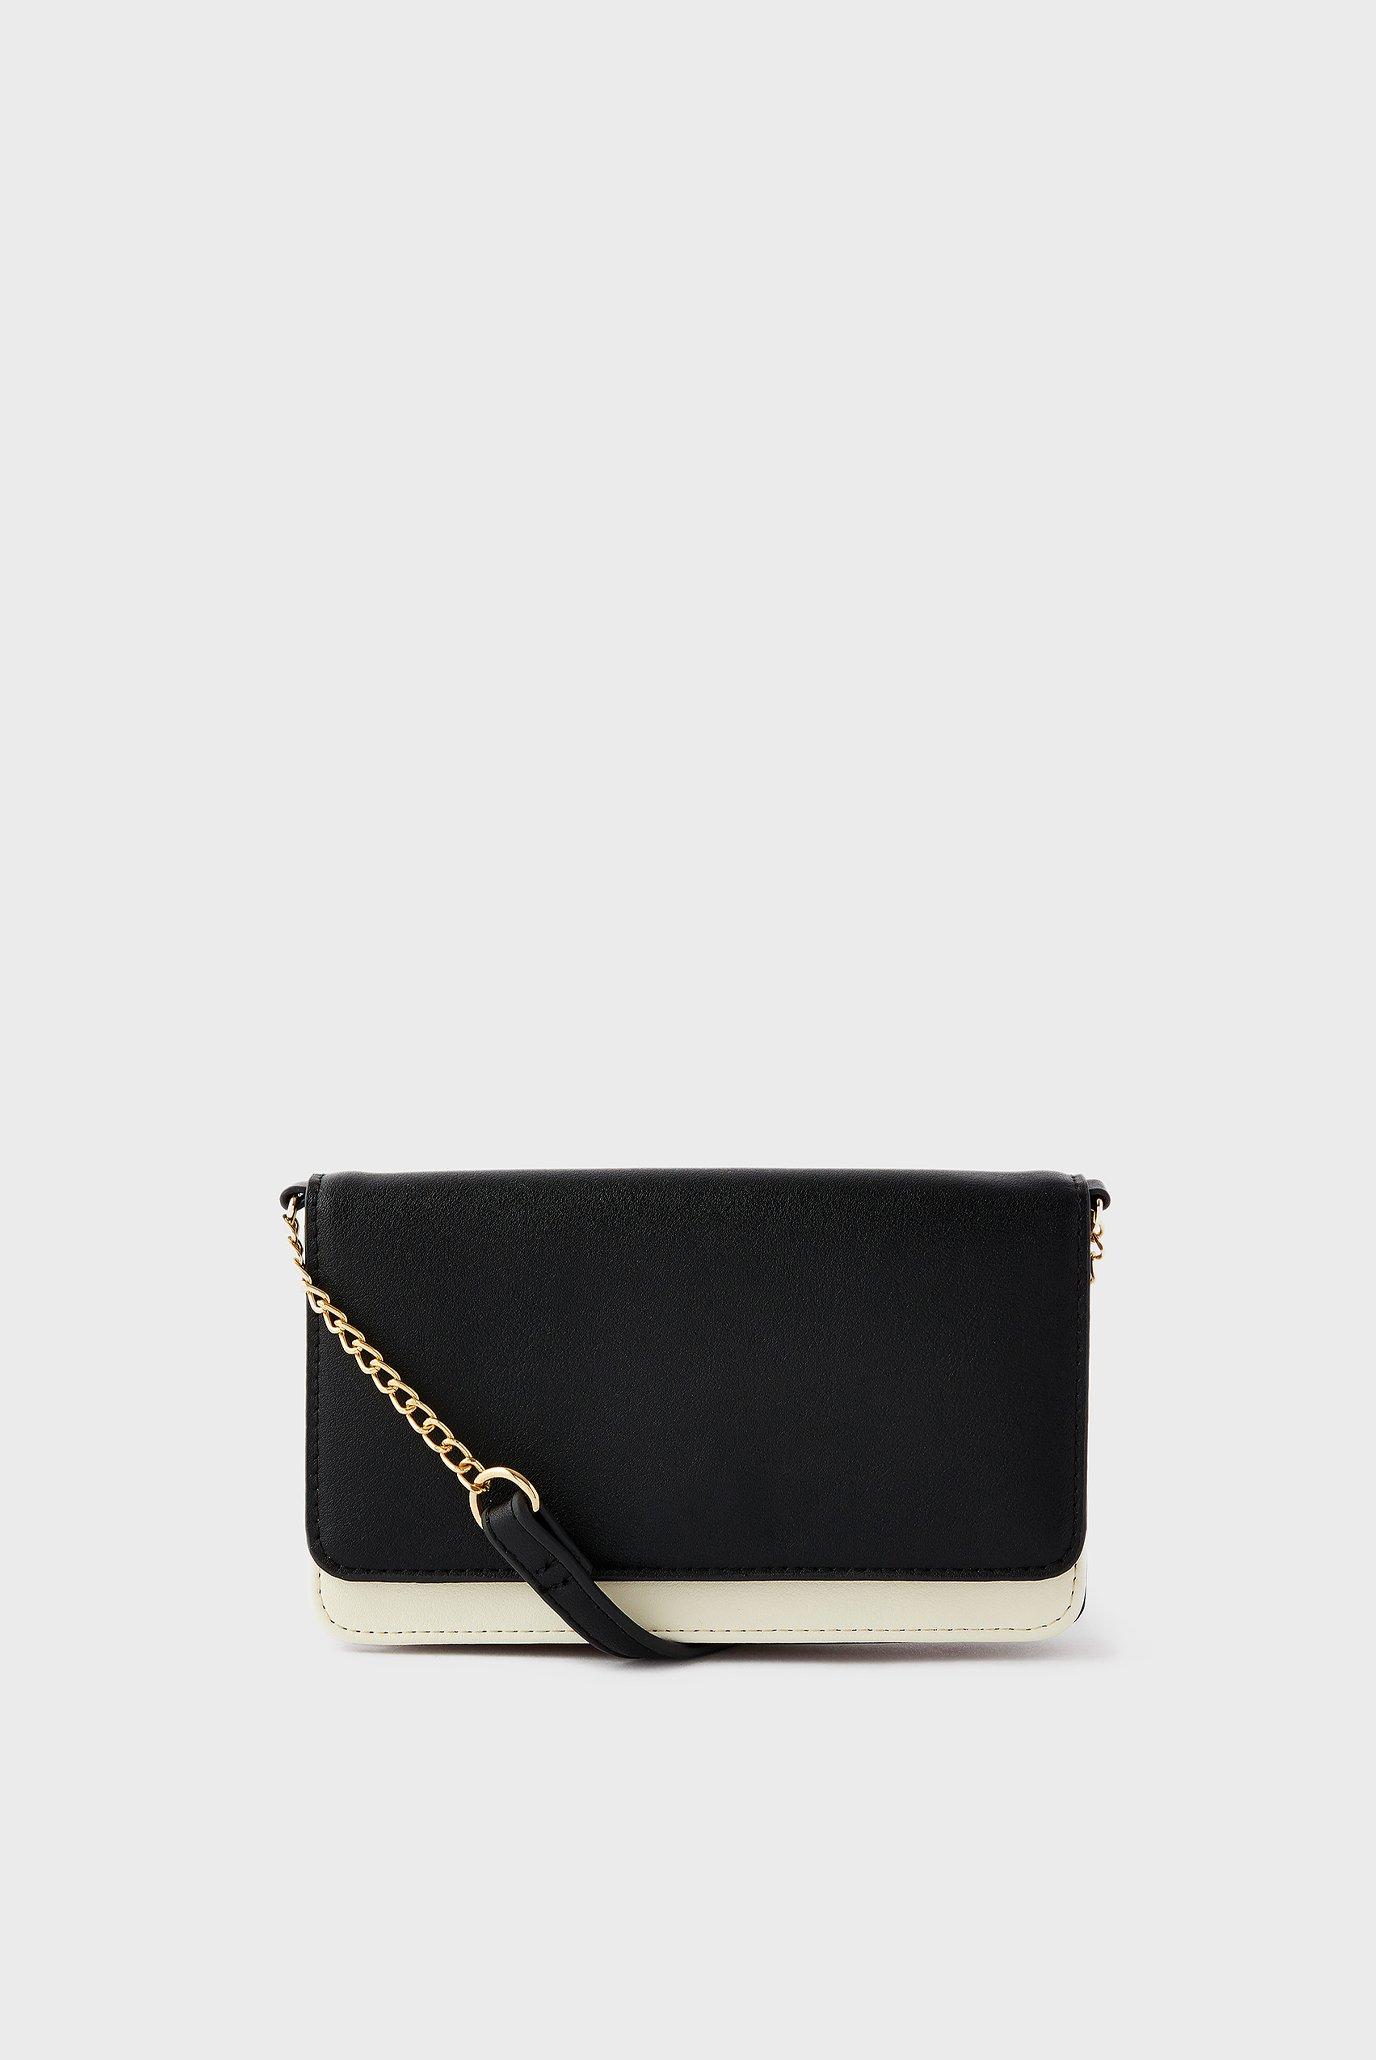 Жіноча чорна сумка Pia Chain Purse 1